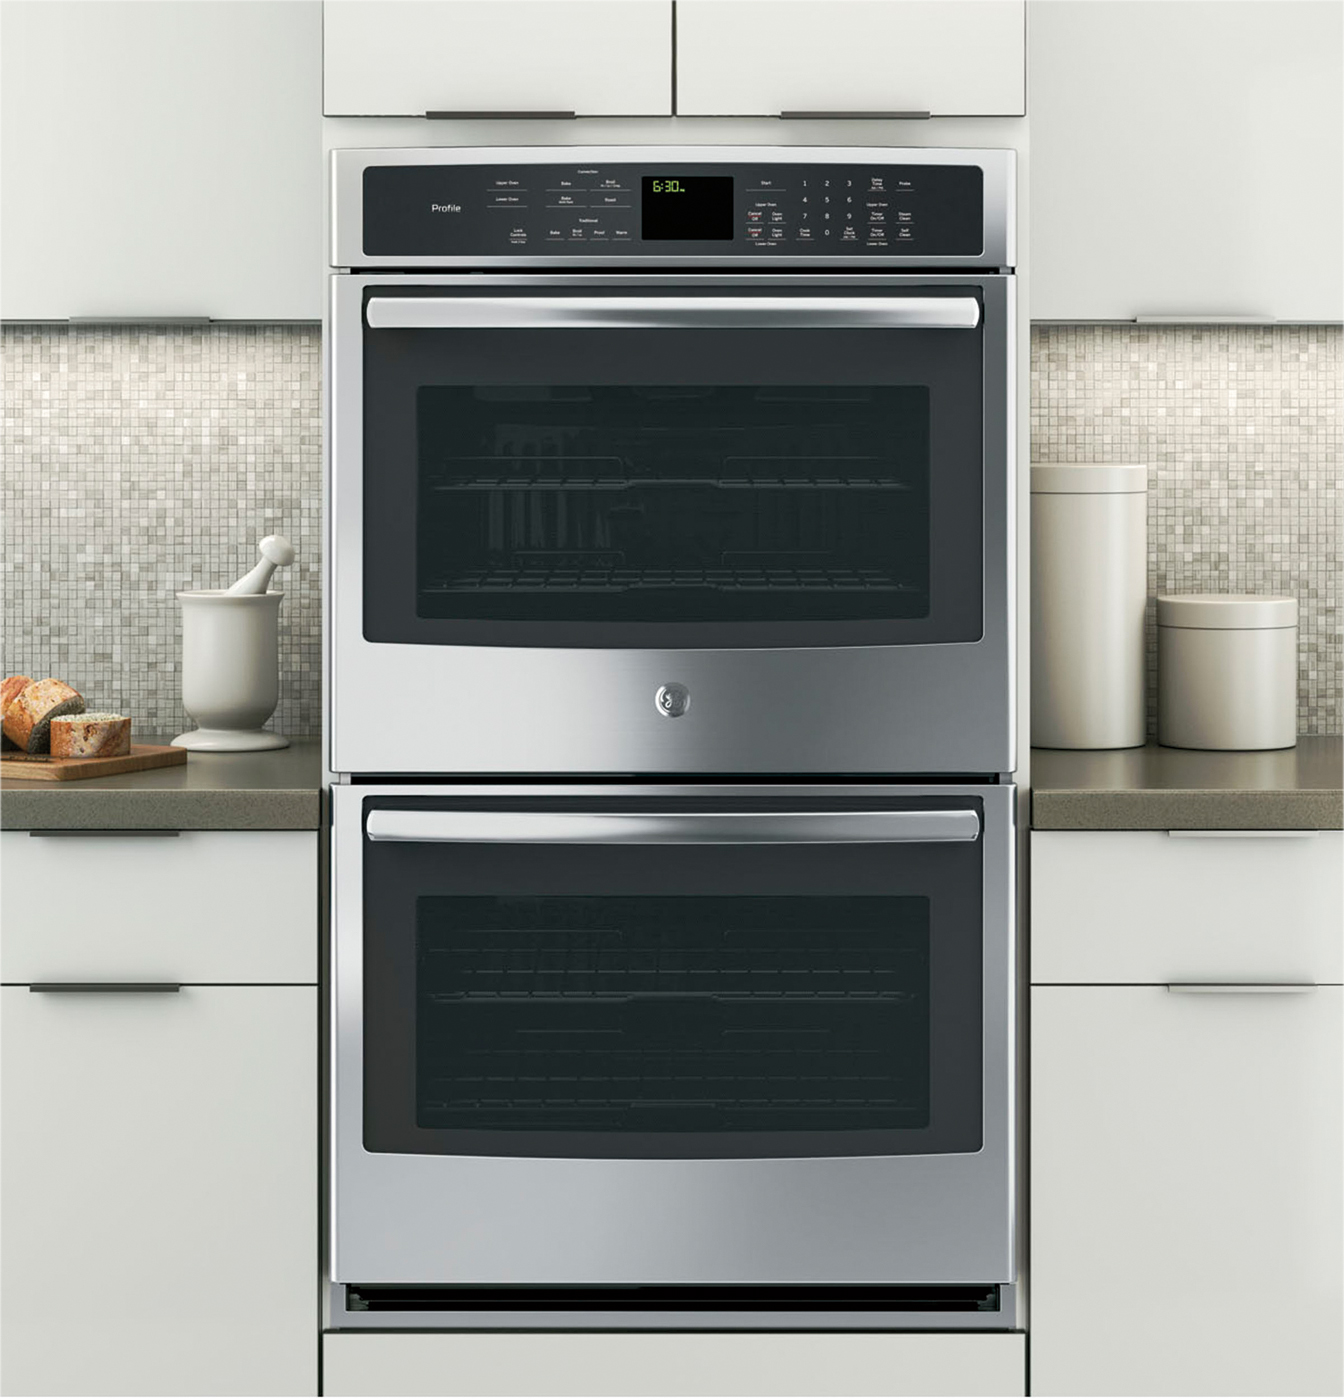 Does Best Buy Hook Up Appliances